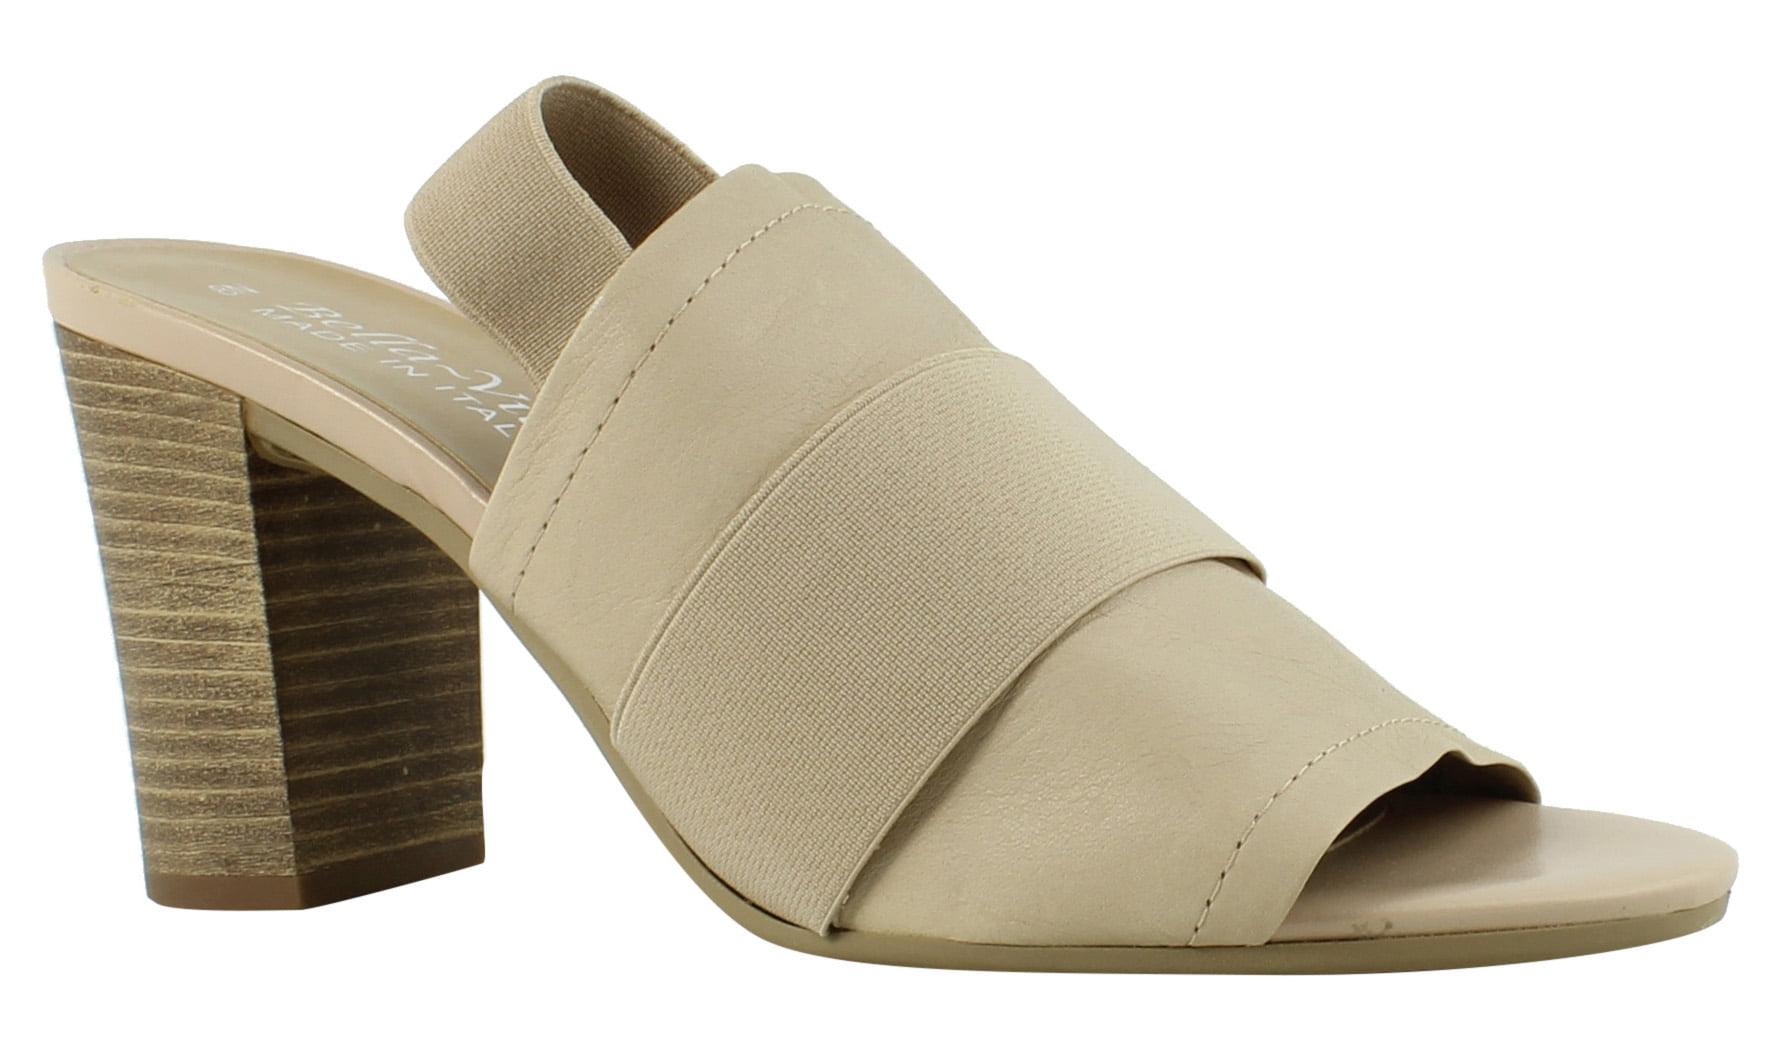 New Bella Vita Womens Sassari Nude Gore Sandals Size 8 (AA,N) by Bella Vita